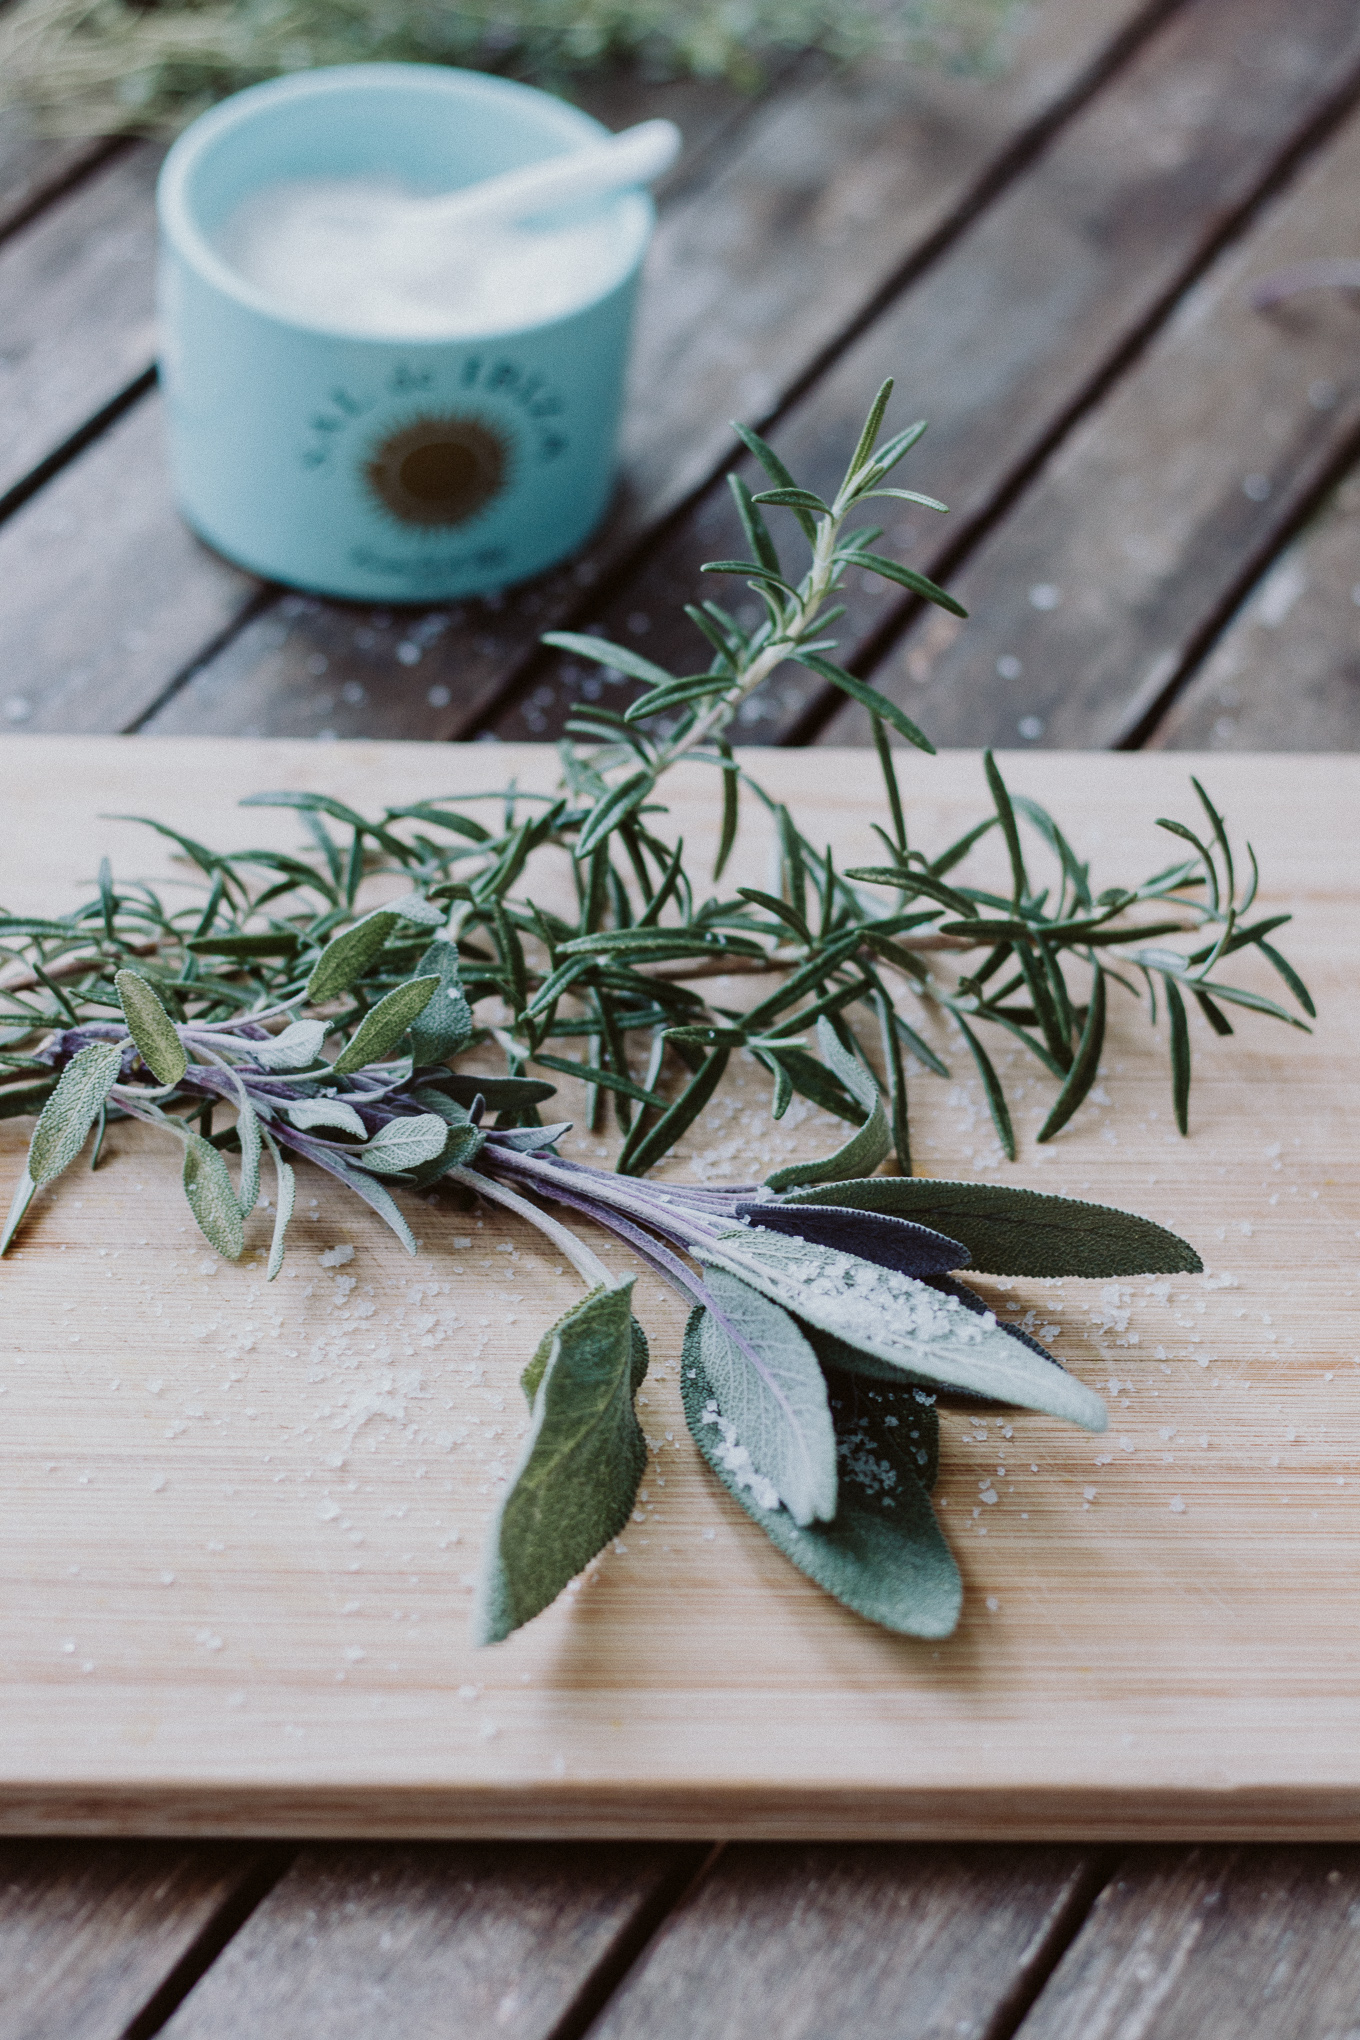 THe Daily Dose Kräuterverwertung Kräuter konservieren